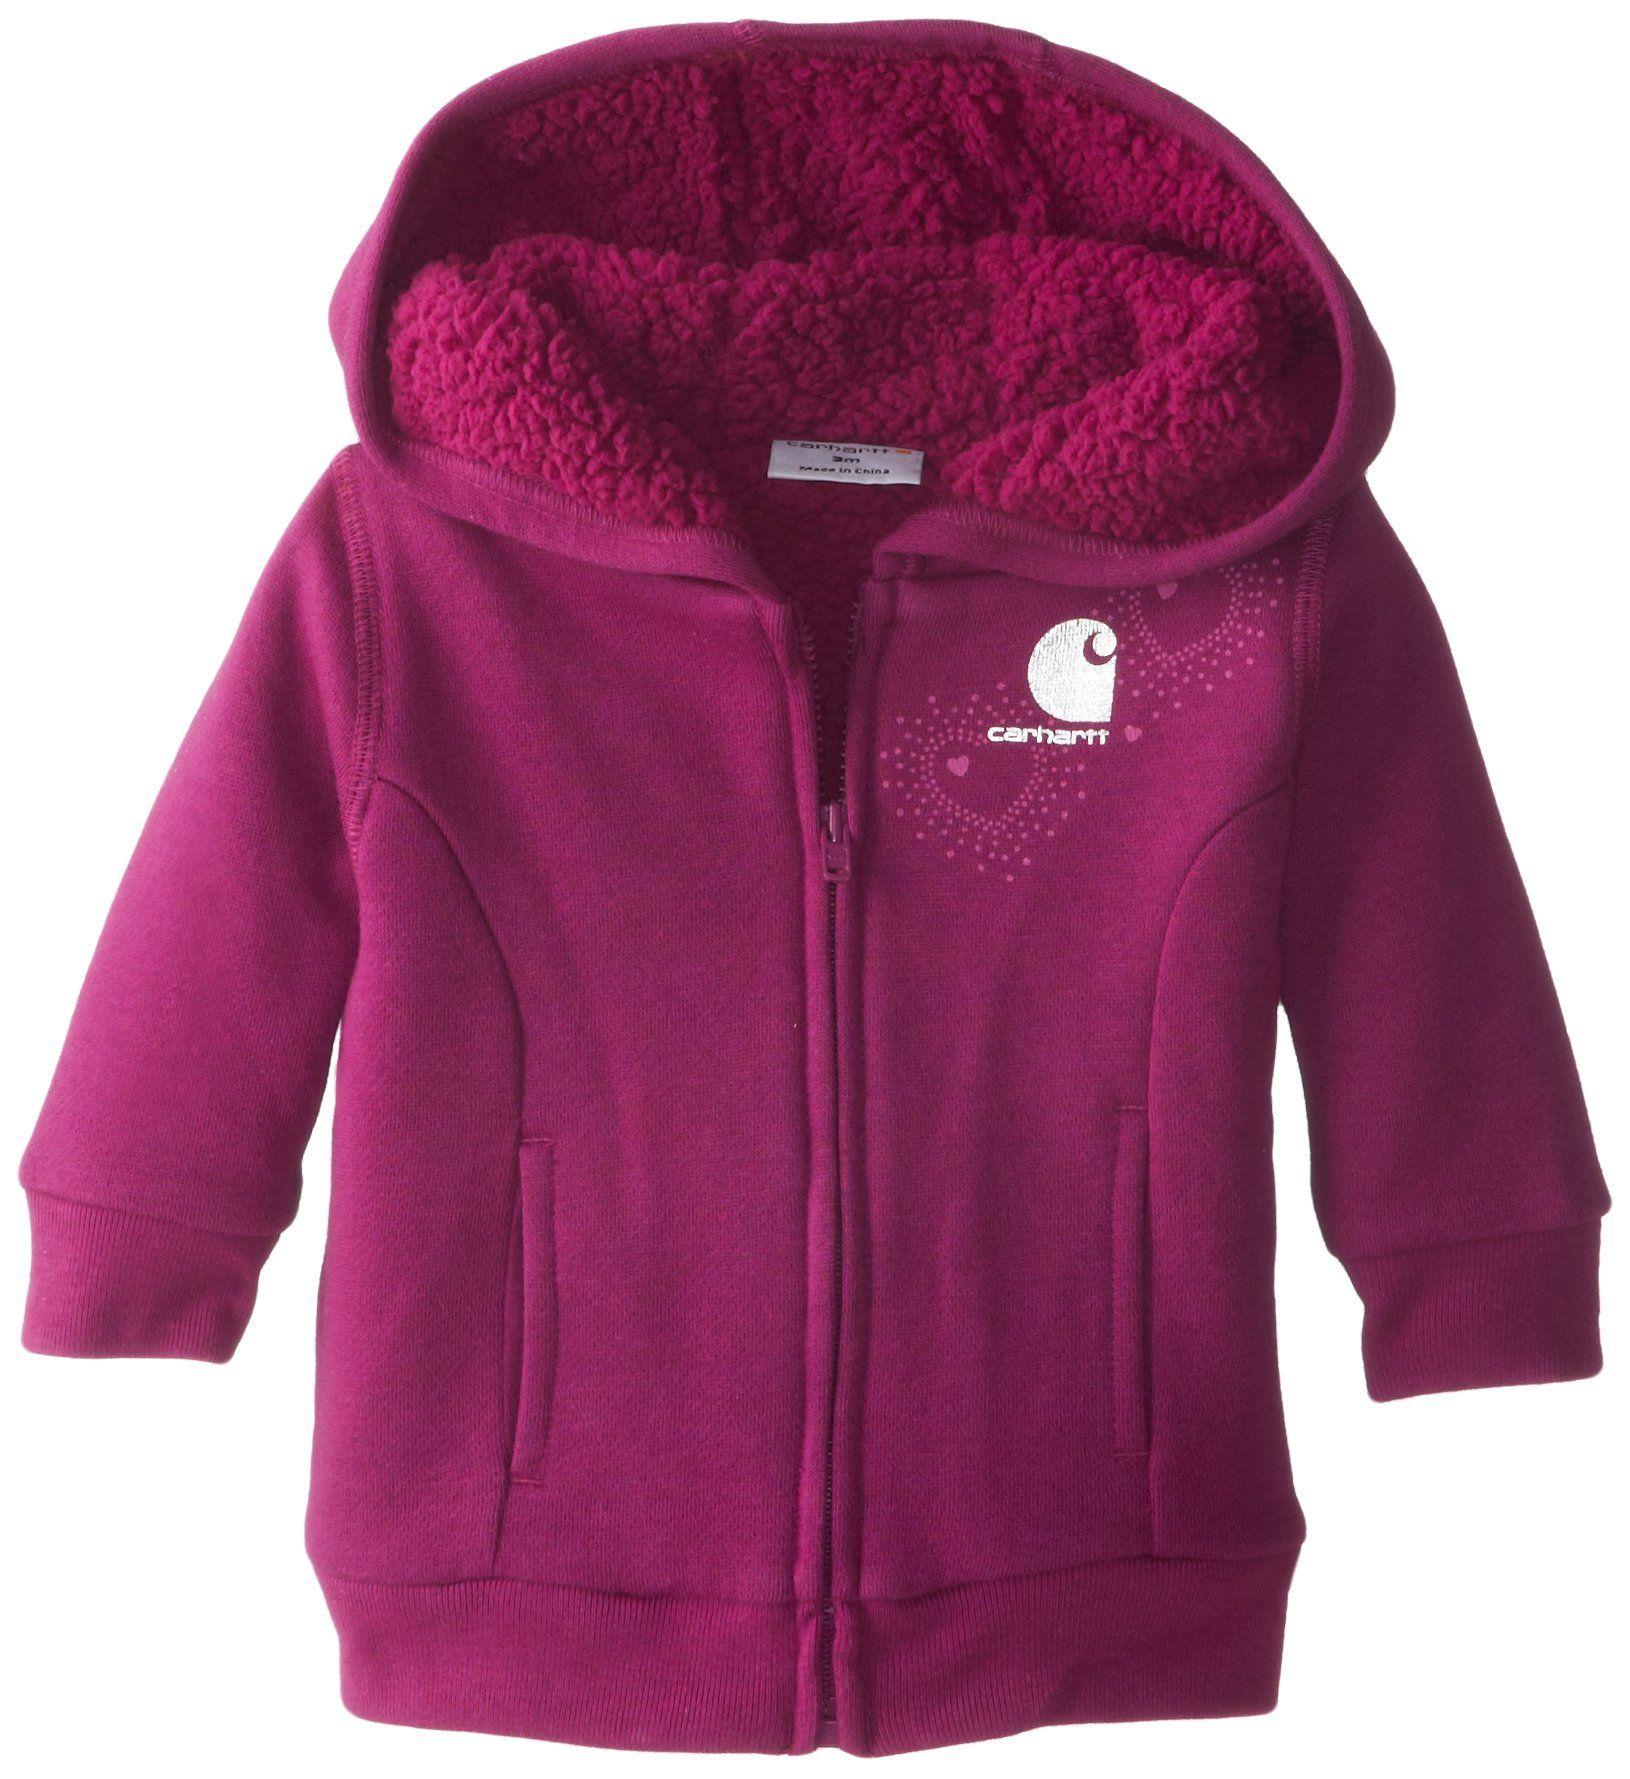 Carhartt Baby-Girls Newborn Brushed Fleece Pant Purple